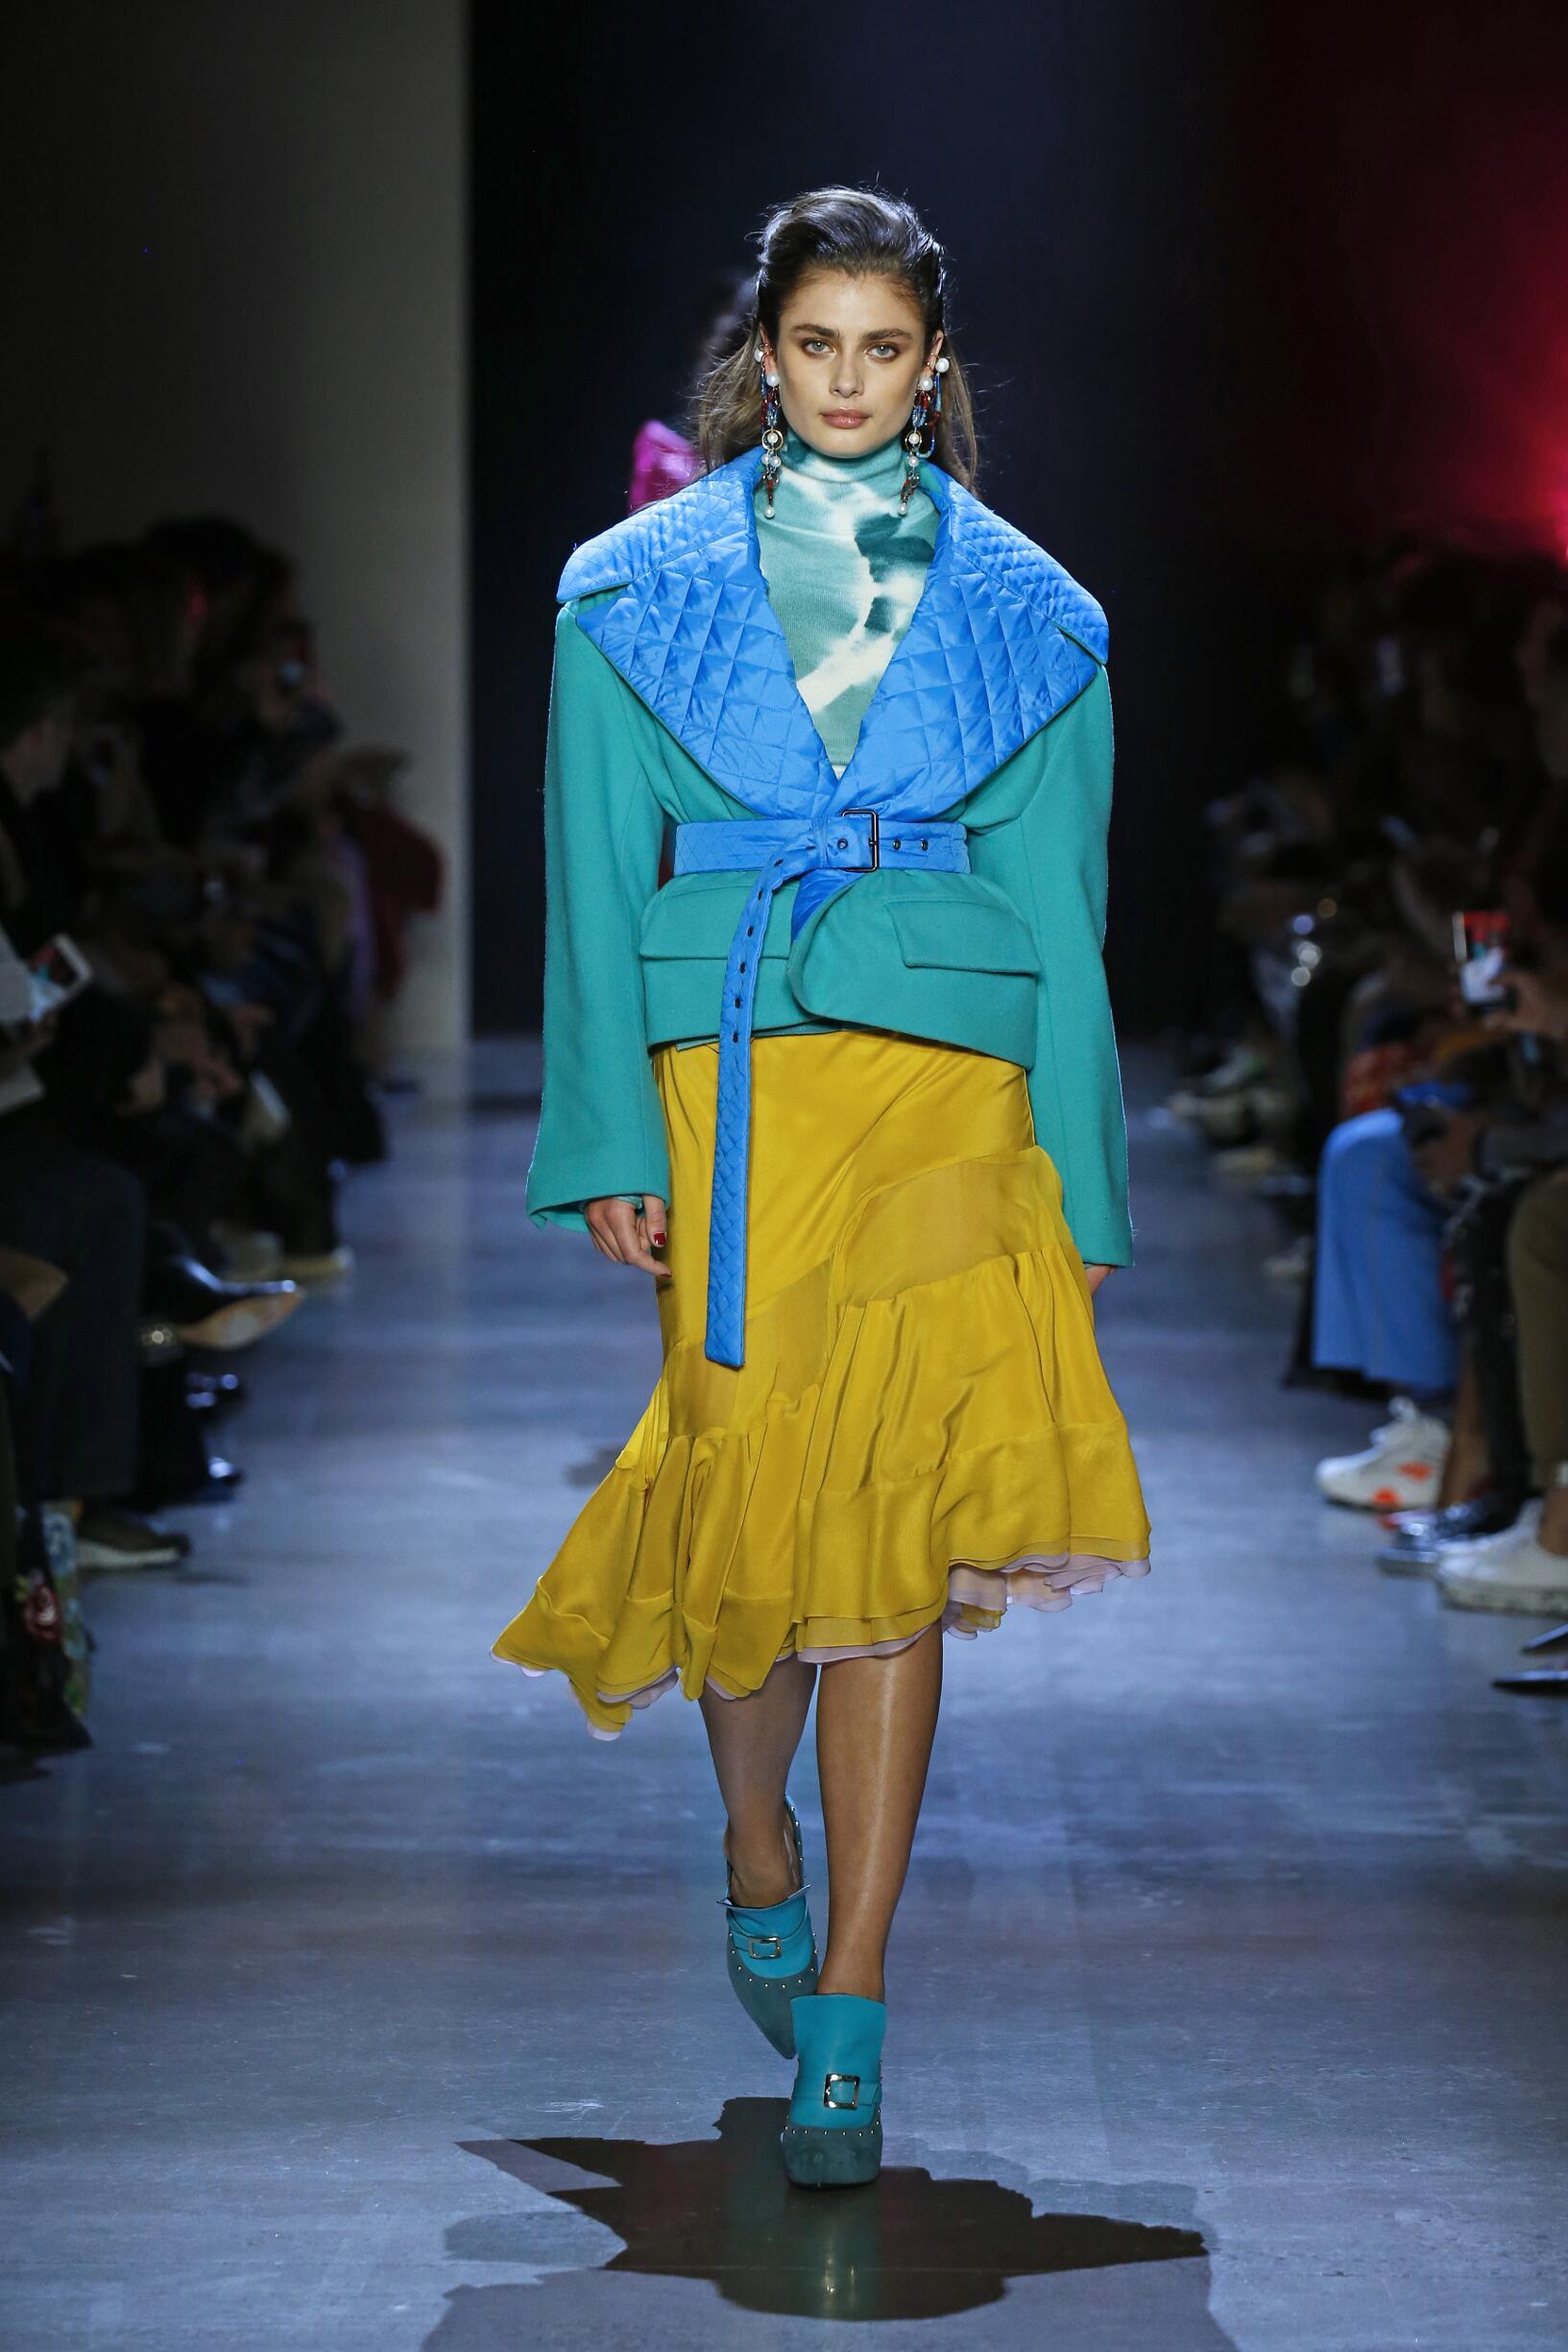 FW 2019-20 Prabal Gurung Fashion Show